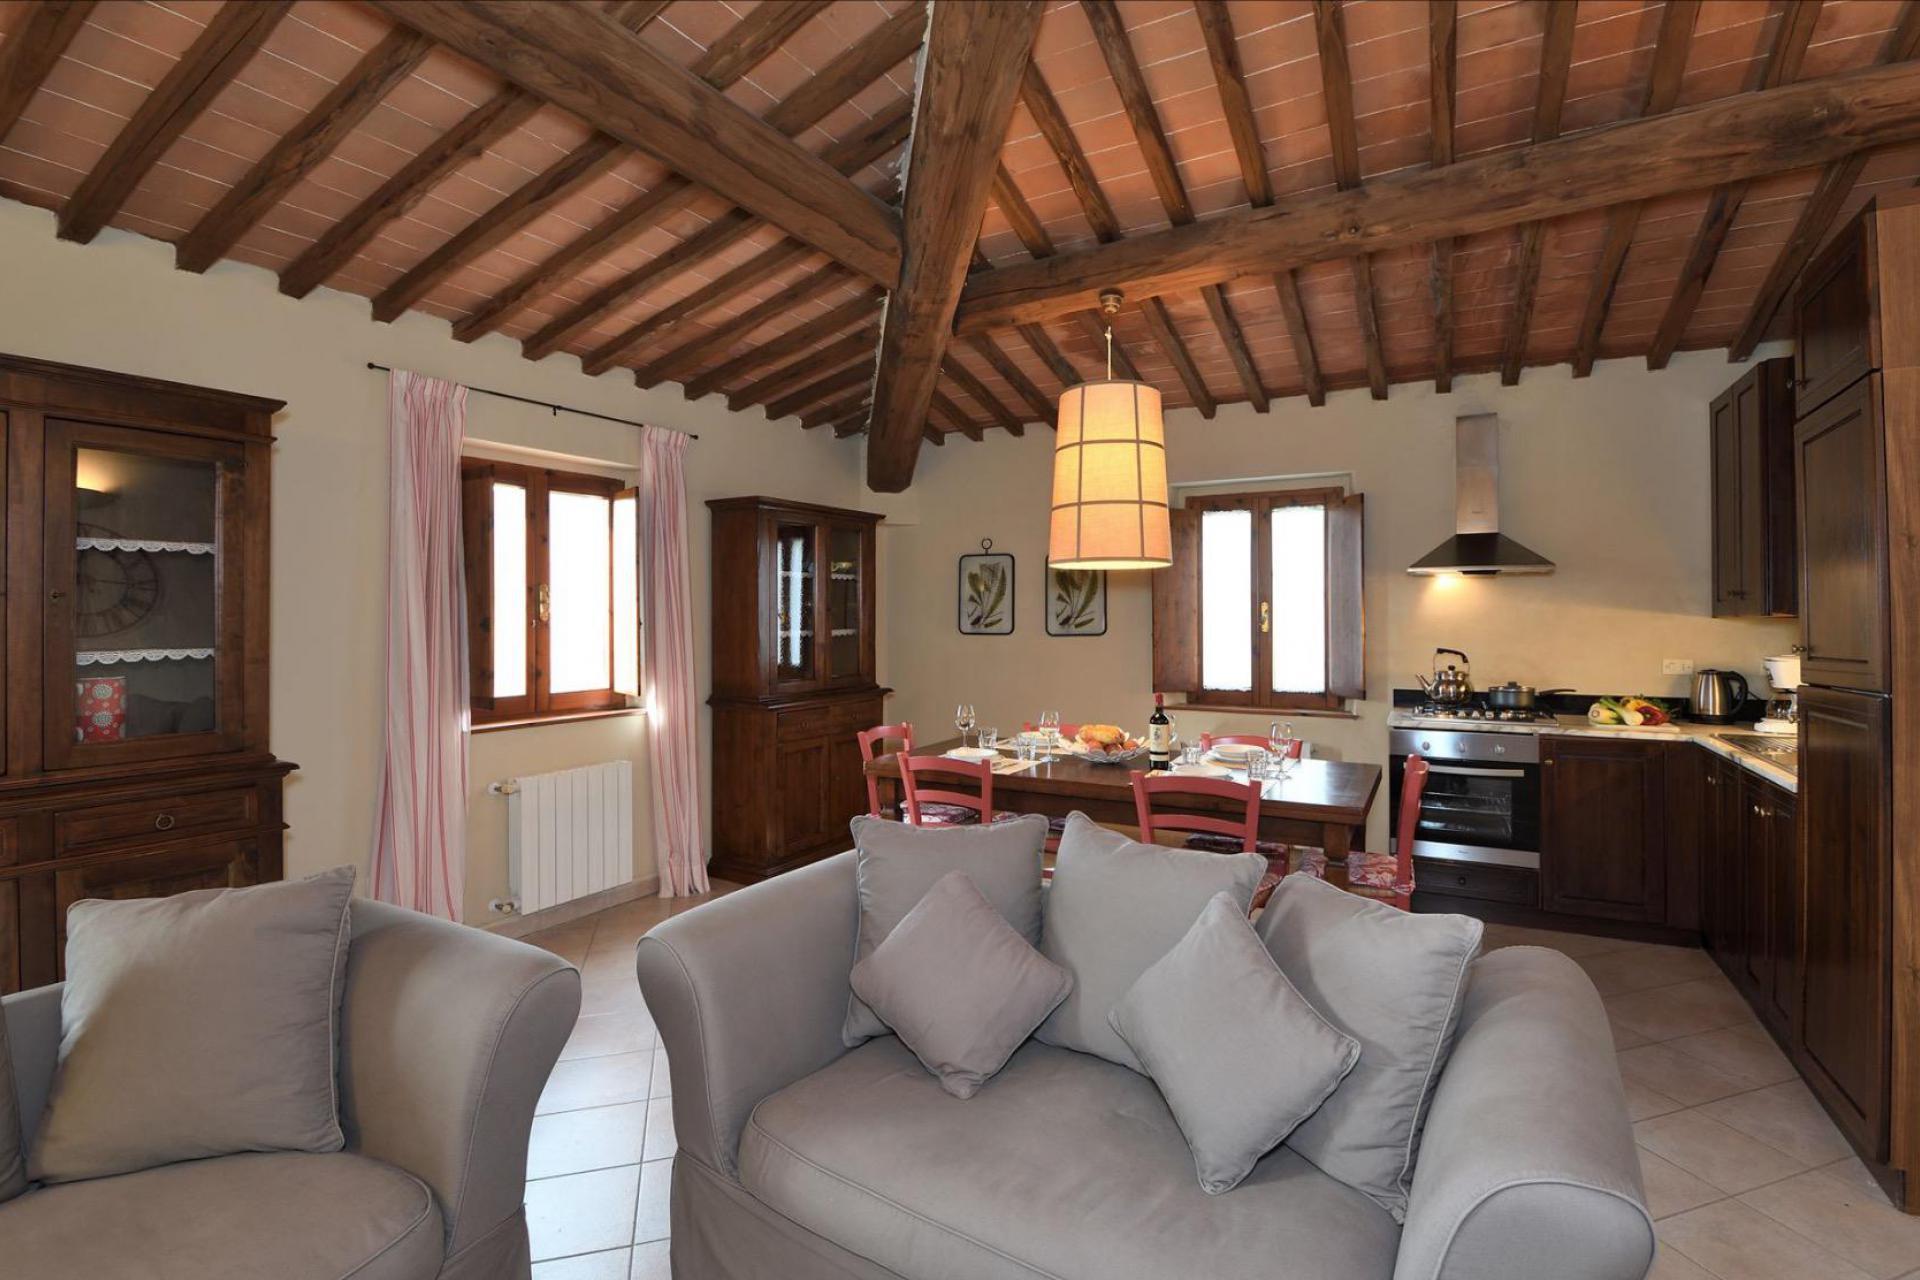 Agriturismo Toscane 7 smaakvolle appartementen in centraal-Toscane | myitaly.nl